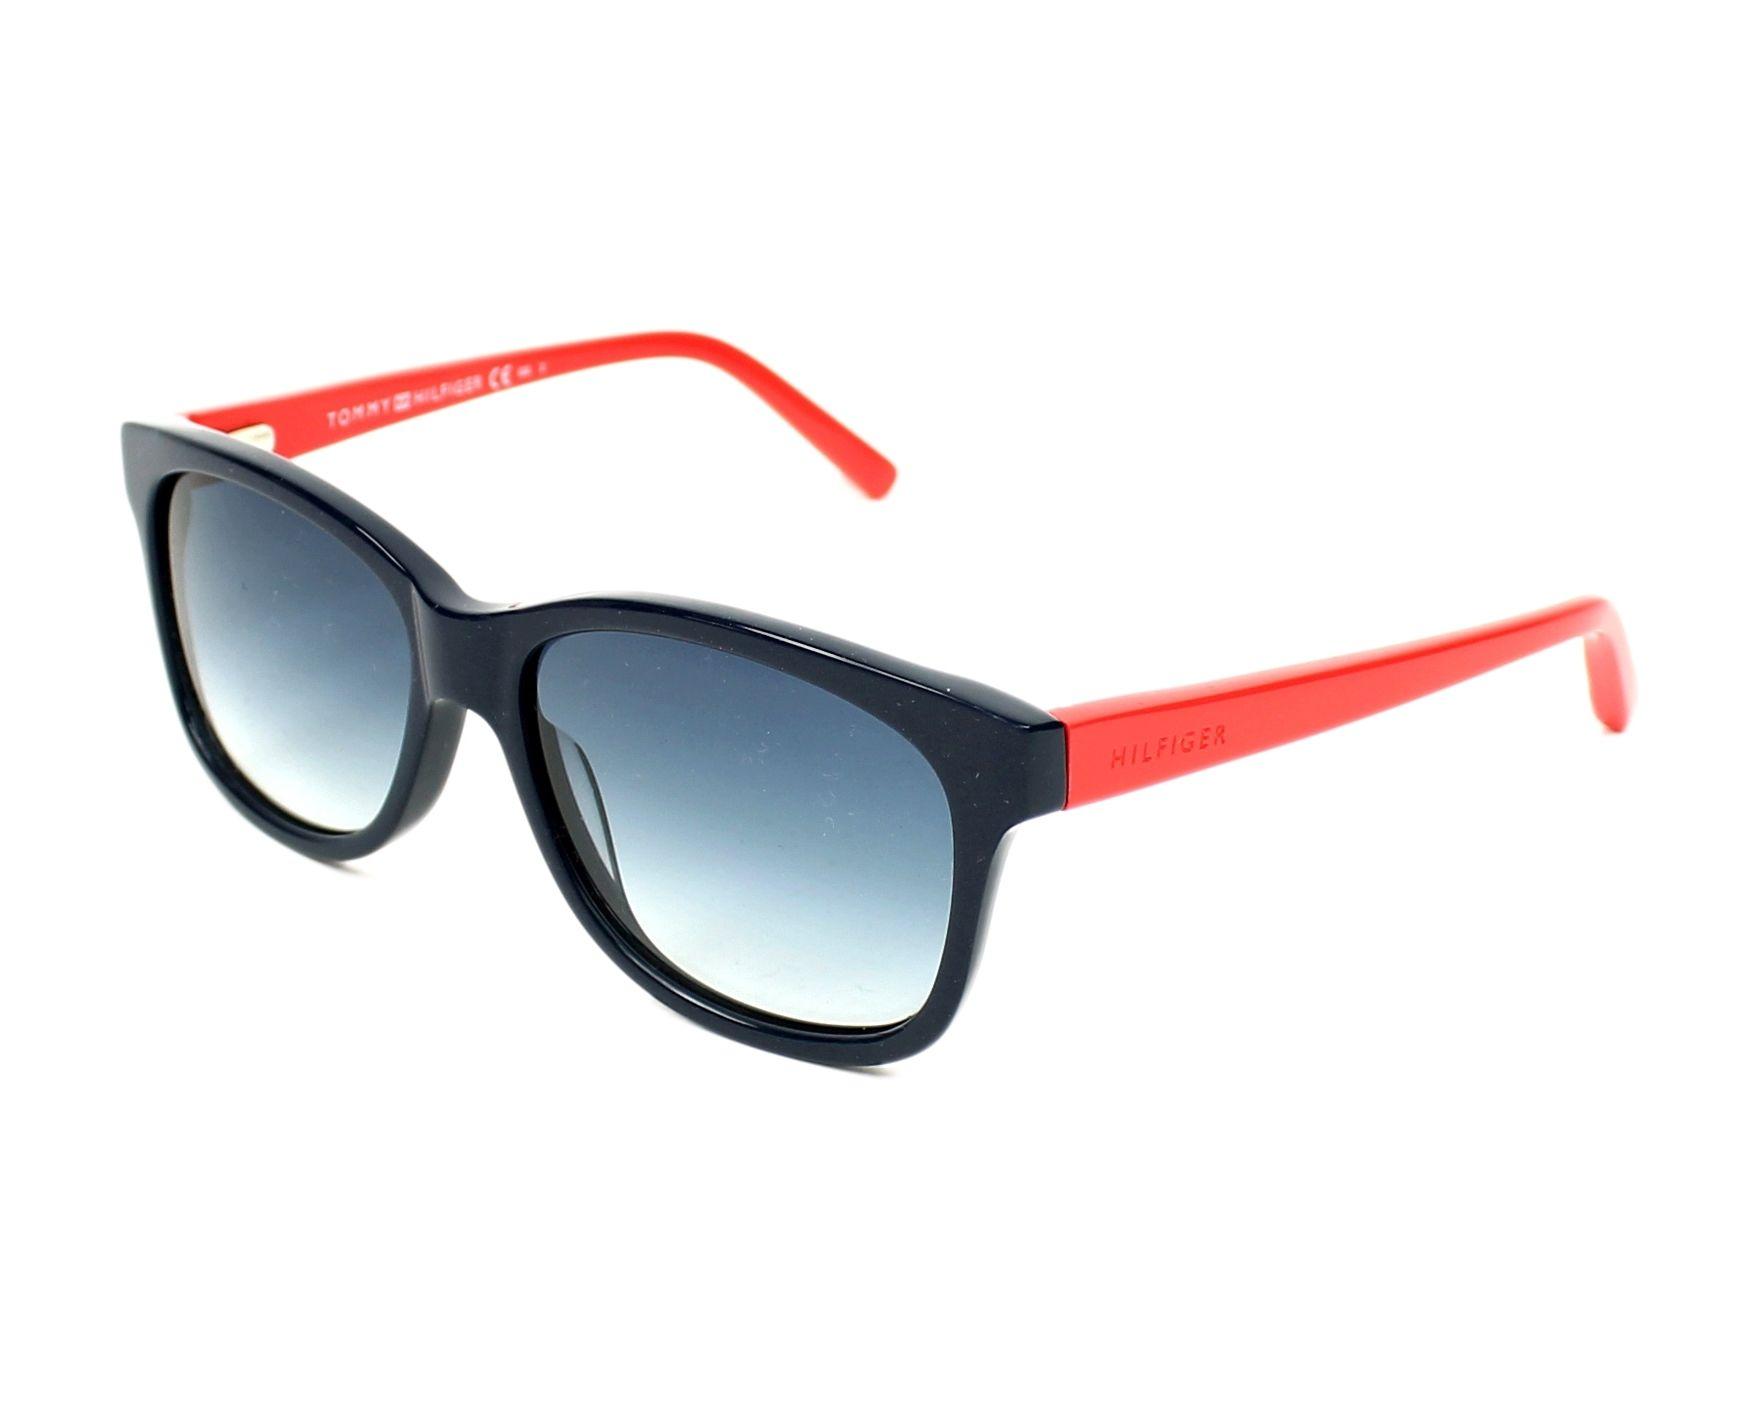 lunettes de soleil tommy hilfiger th 1073 s 406 08 bleu avec des verres bleu. Black Bedroom Furniture Sets. Home Design Ideas